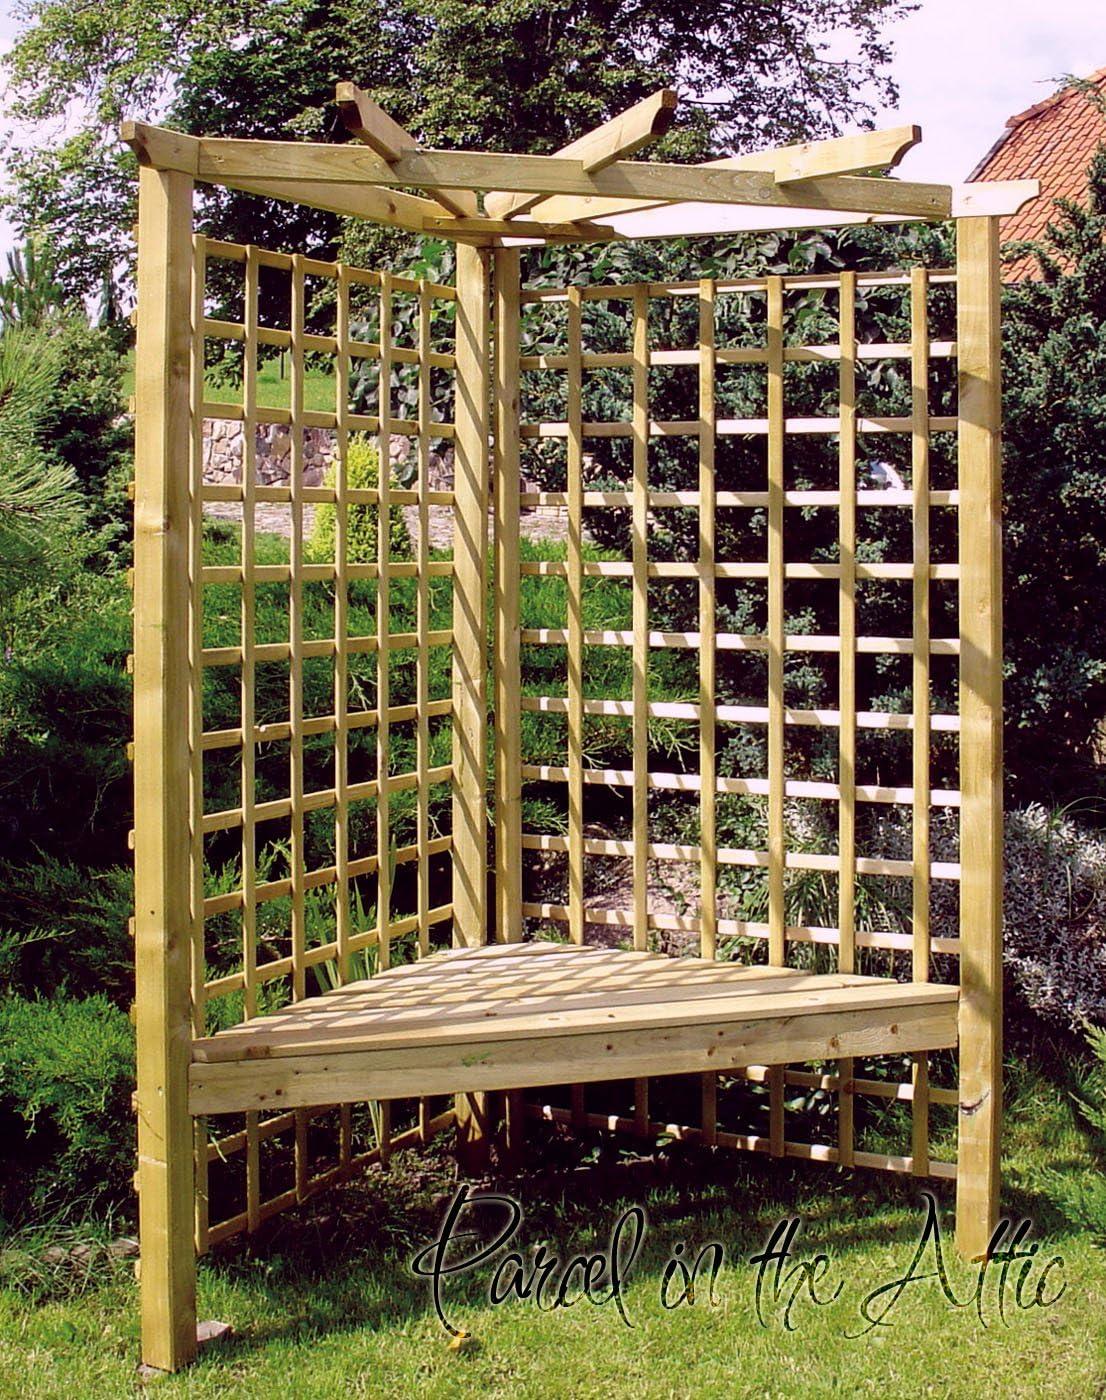 Pergola madera asiento de jardín Arbour metal works para dolores ...